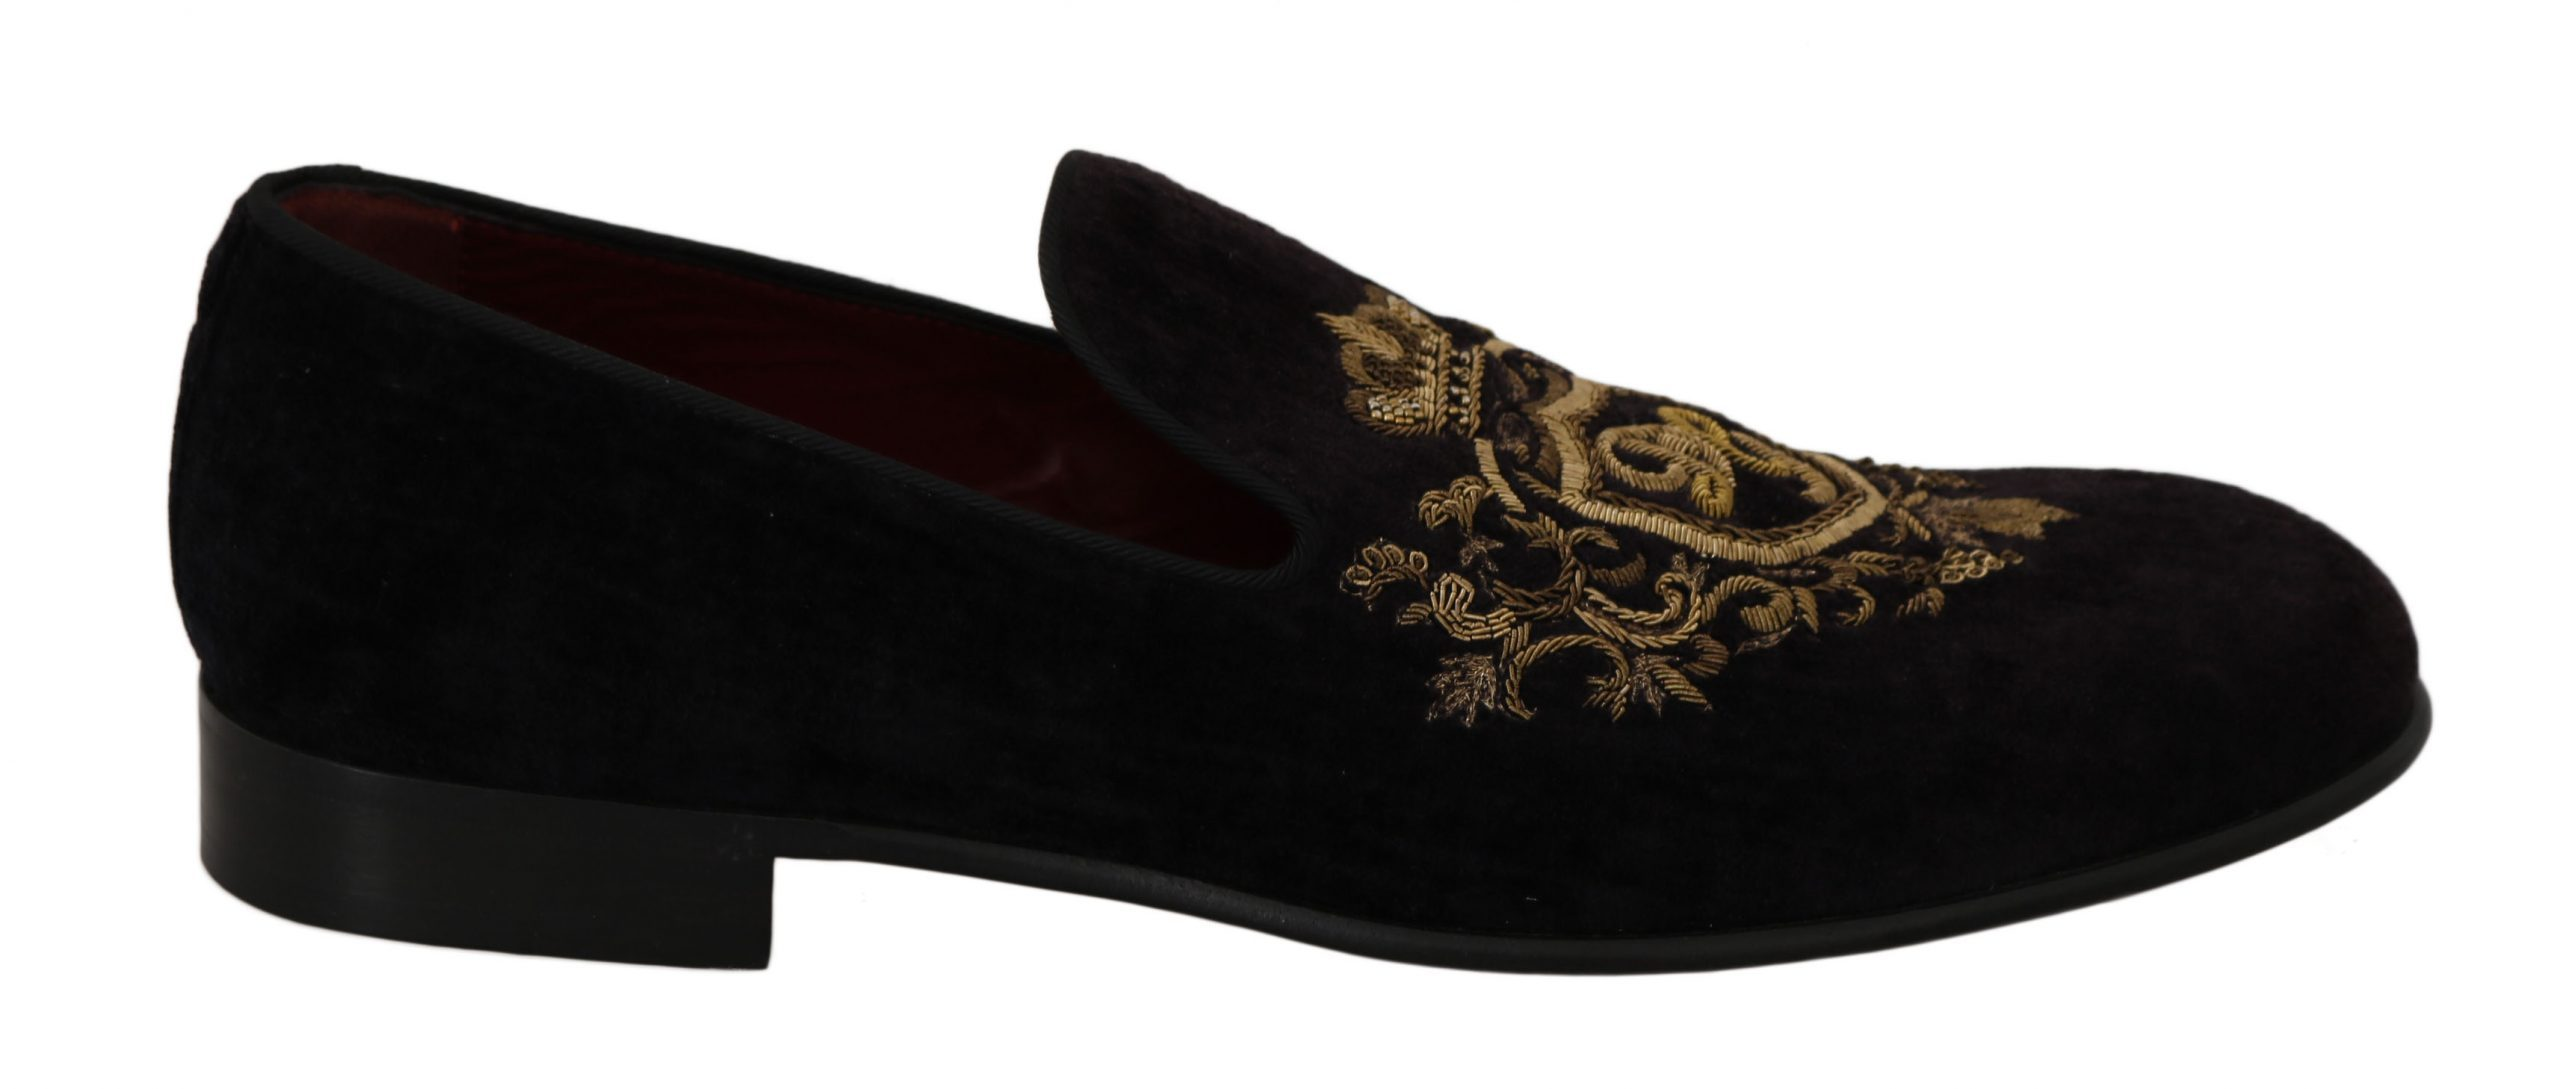 Dolce & Gabbana Men's Shoes Brown MV2348 - EU39/US6